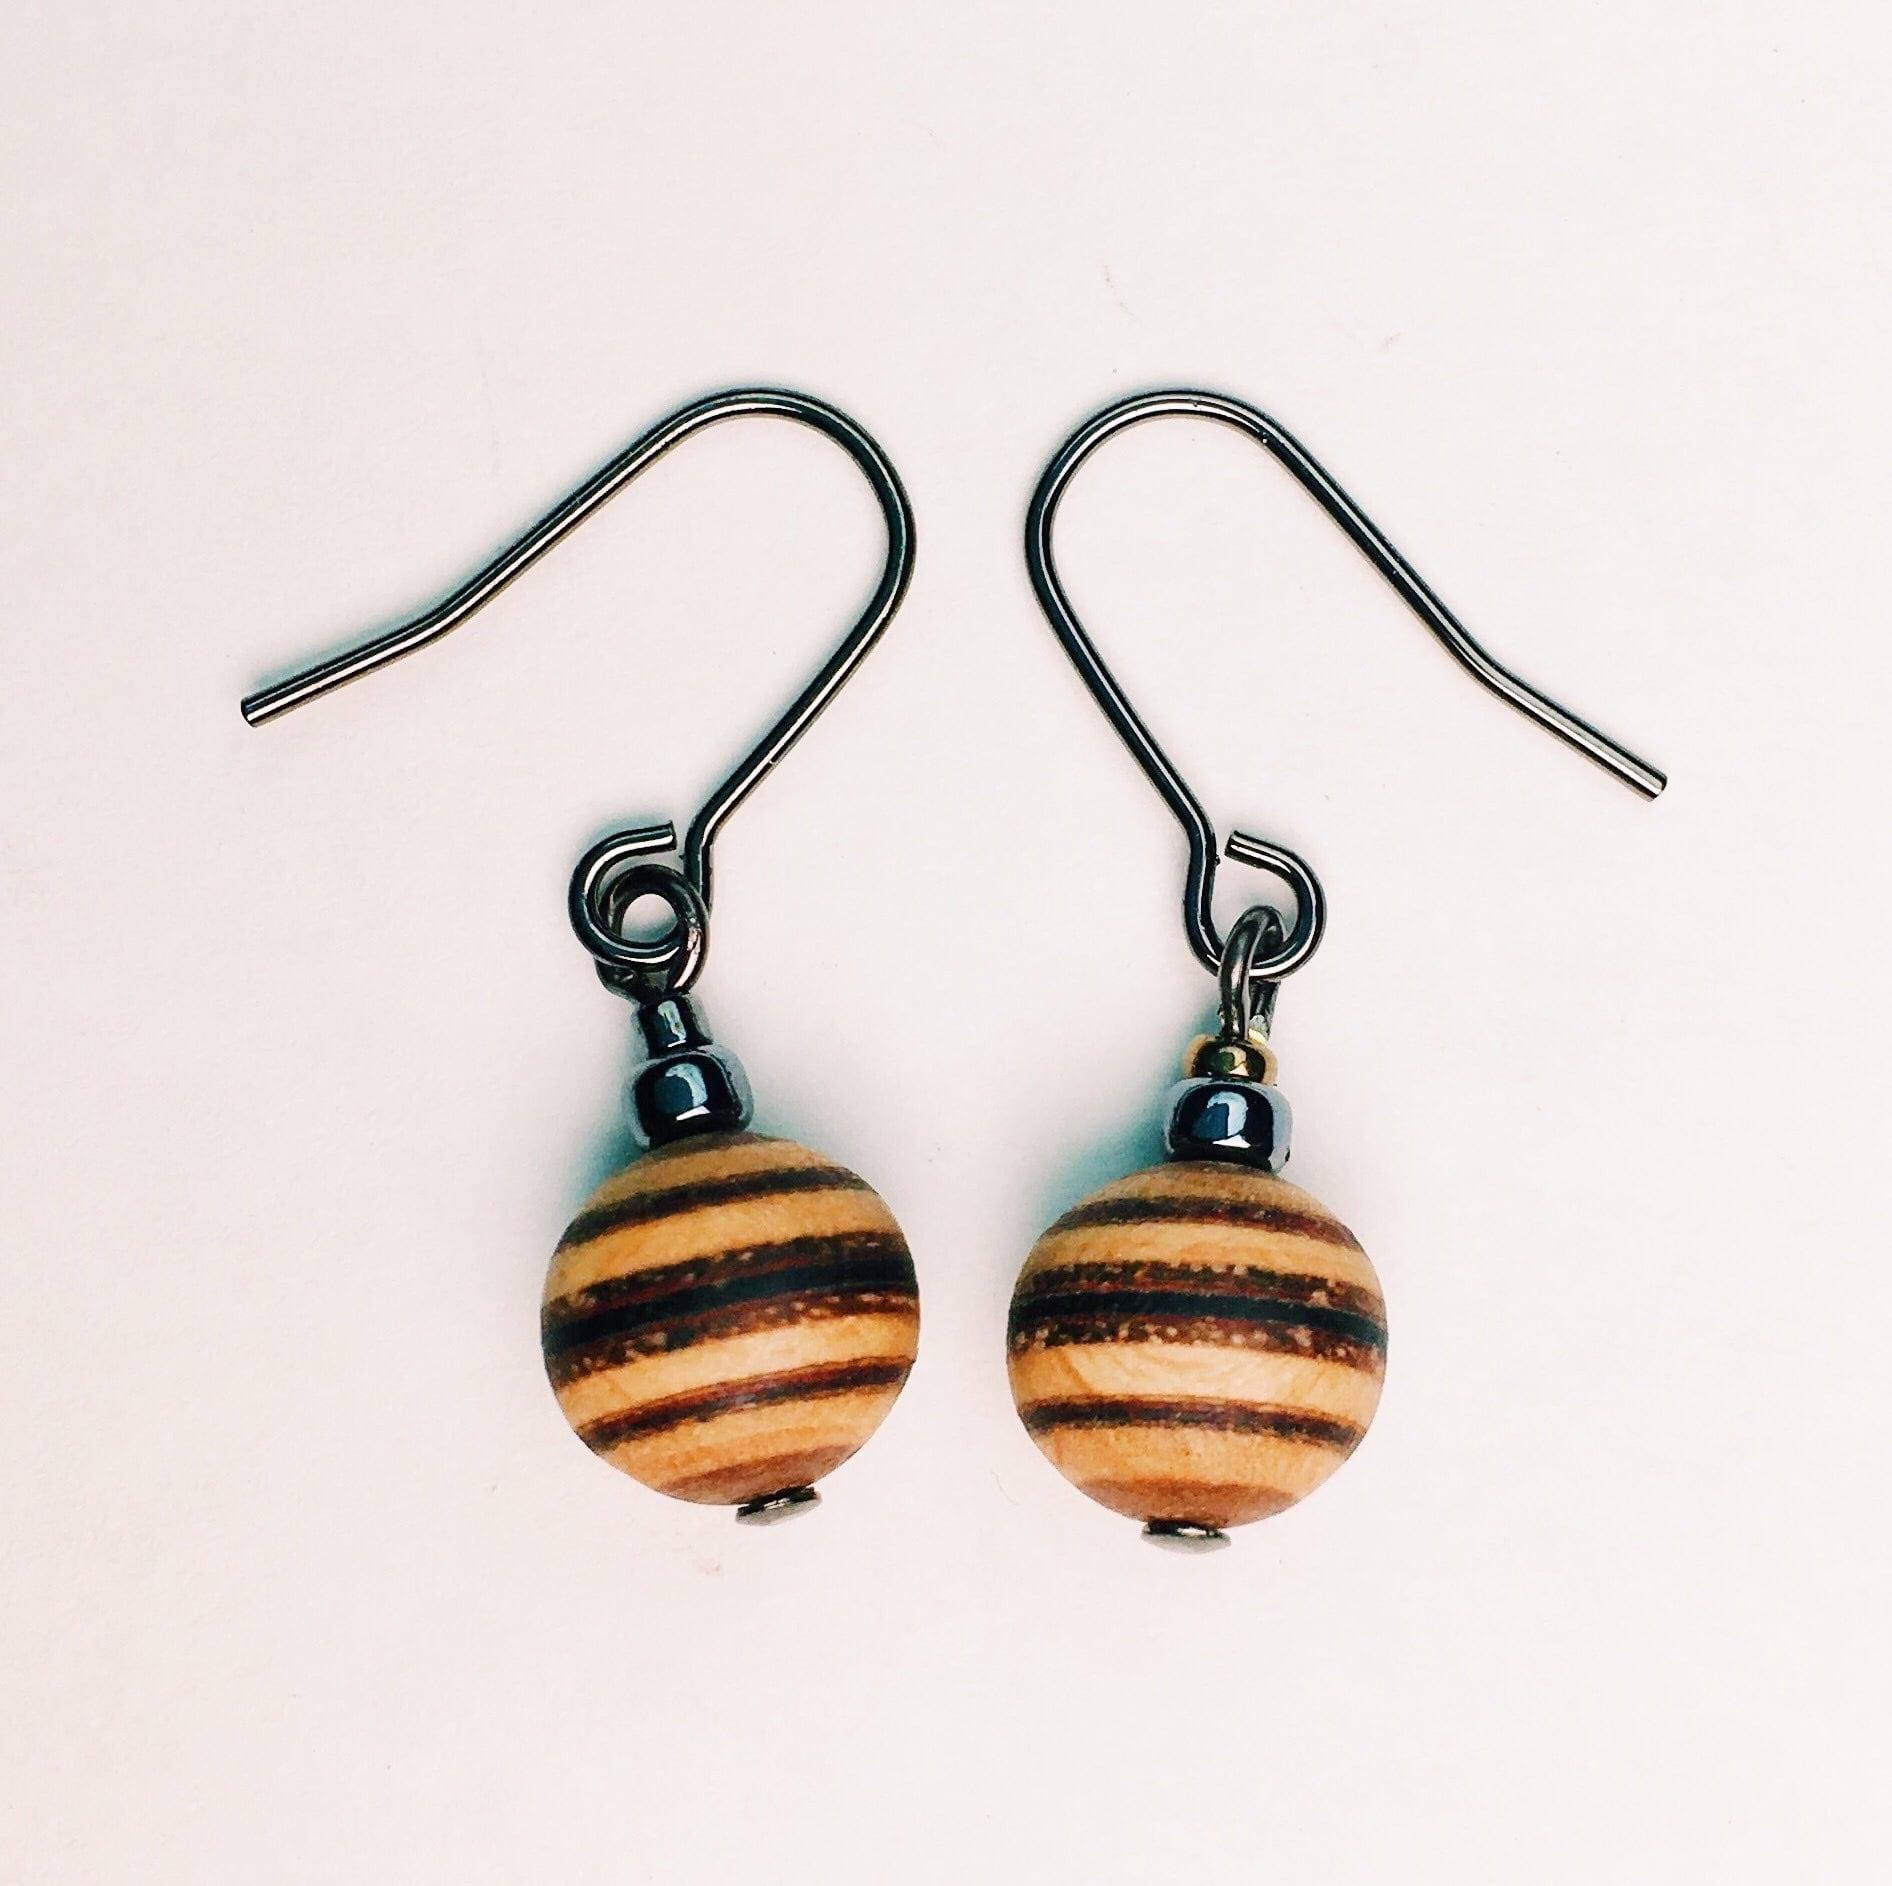 wood ball beads pierce